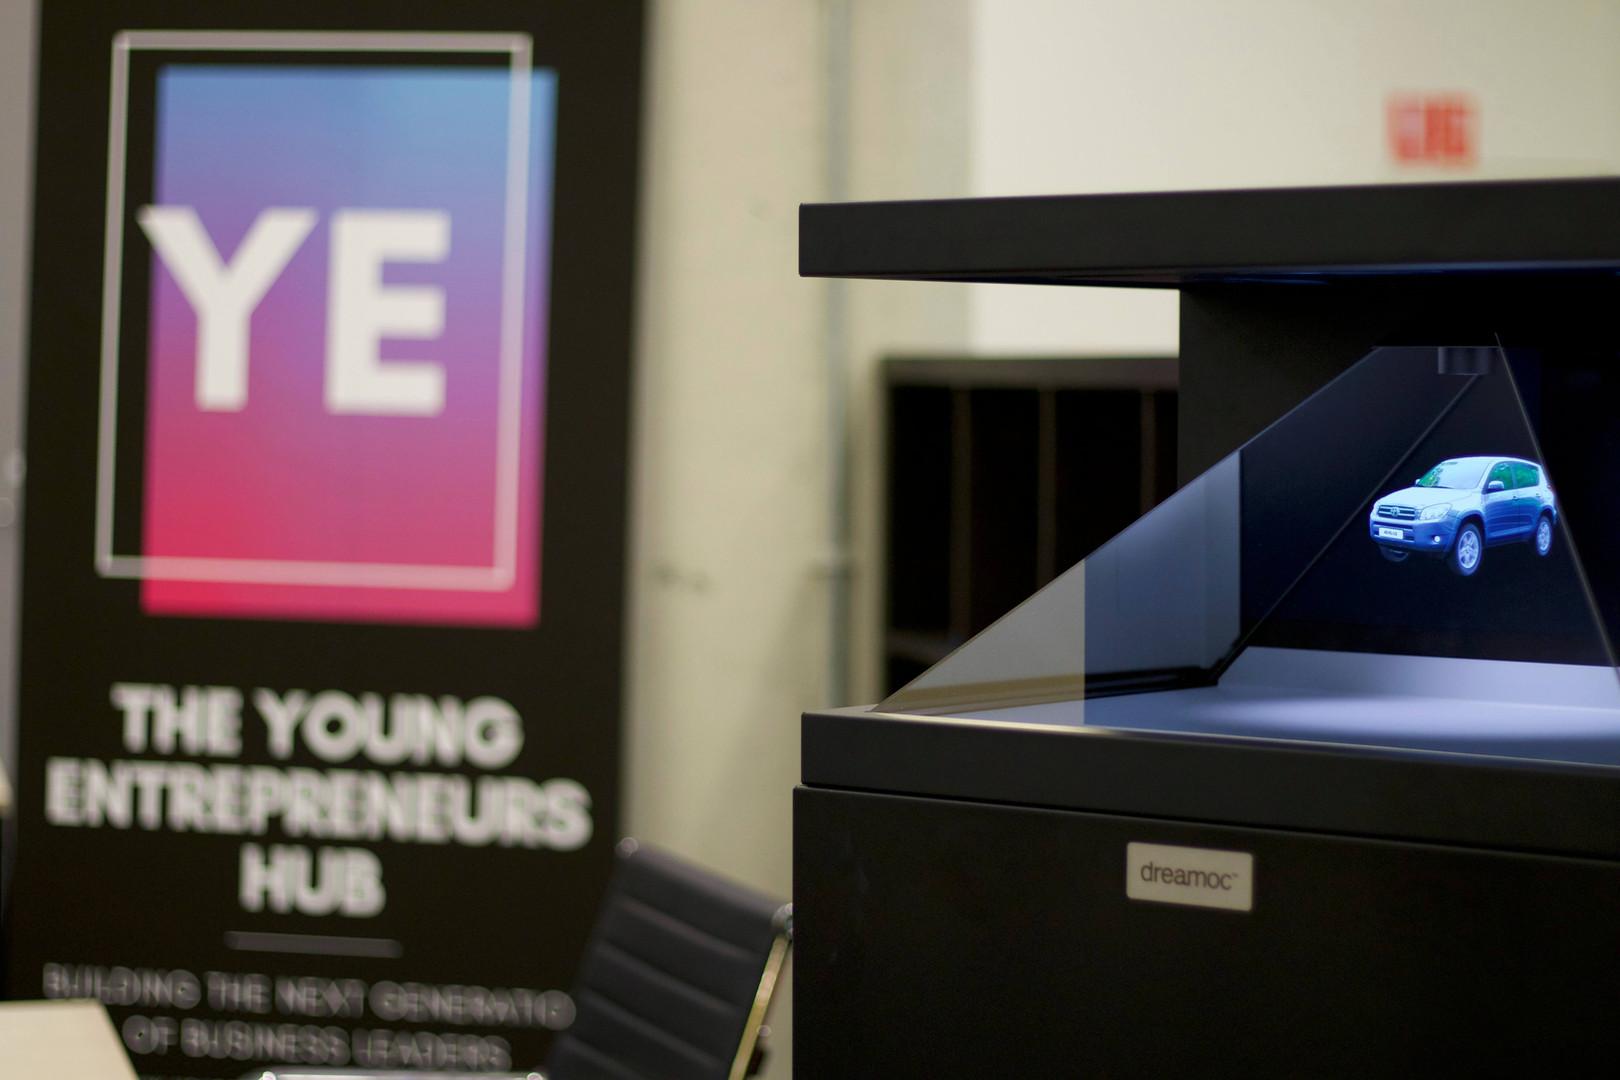 Young Entrepreneurs Hub - Hologram 2.jpg